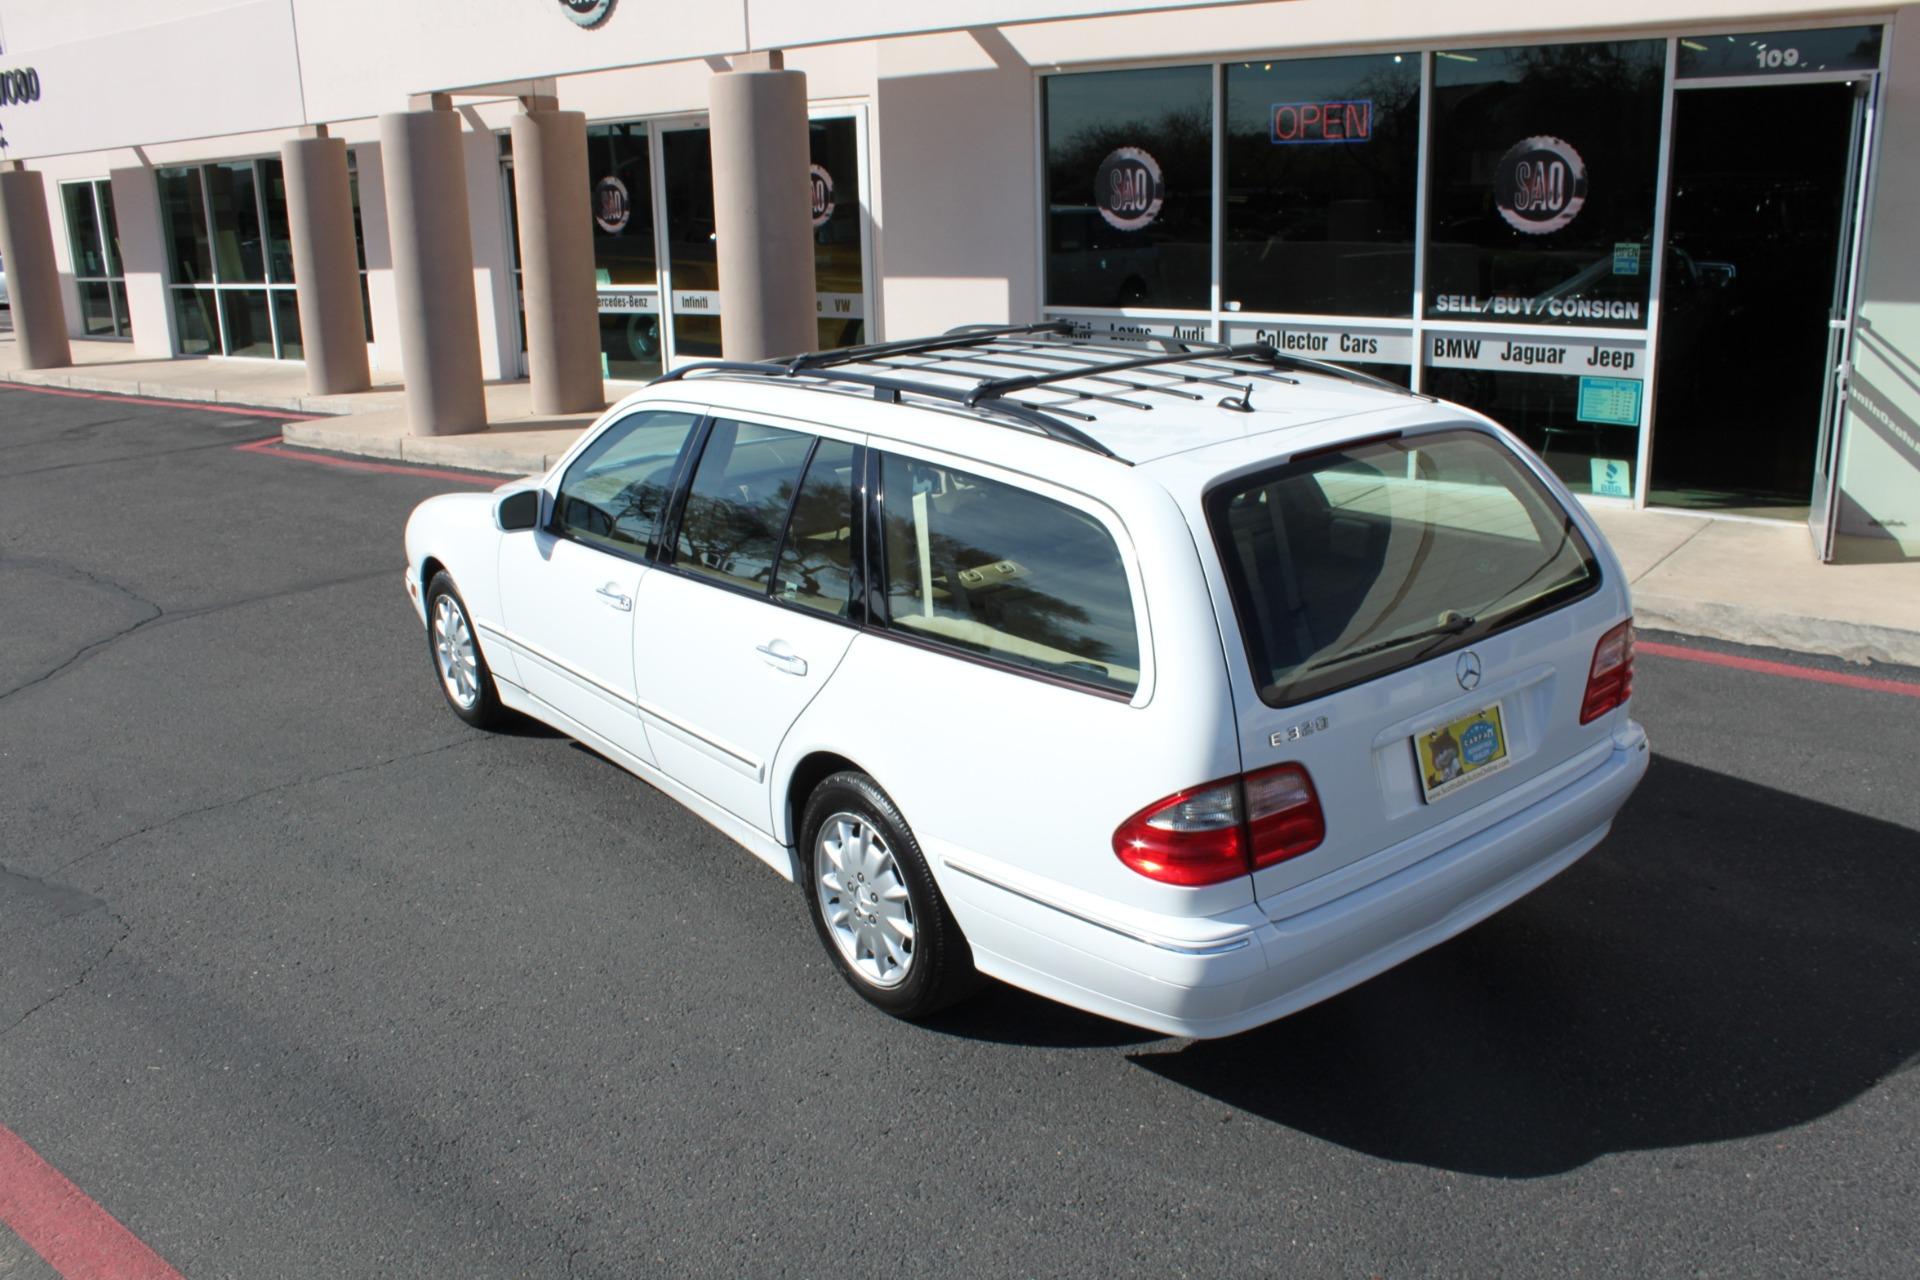 Used-2000-Mercedes-Benz-E-Class-LS430